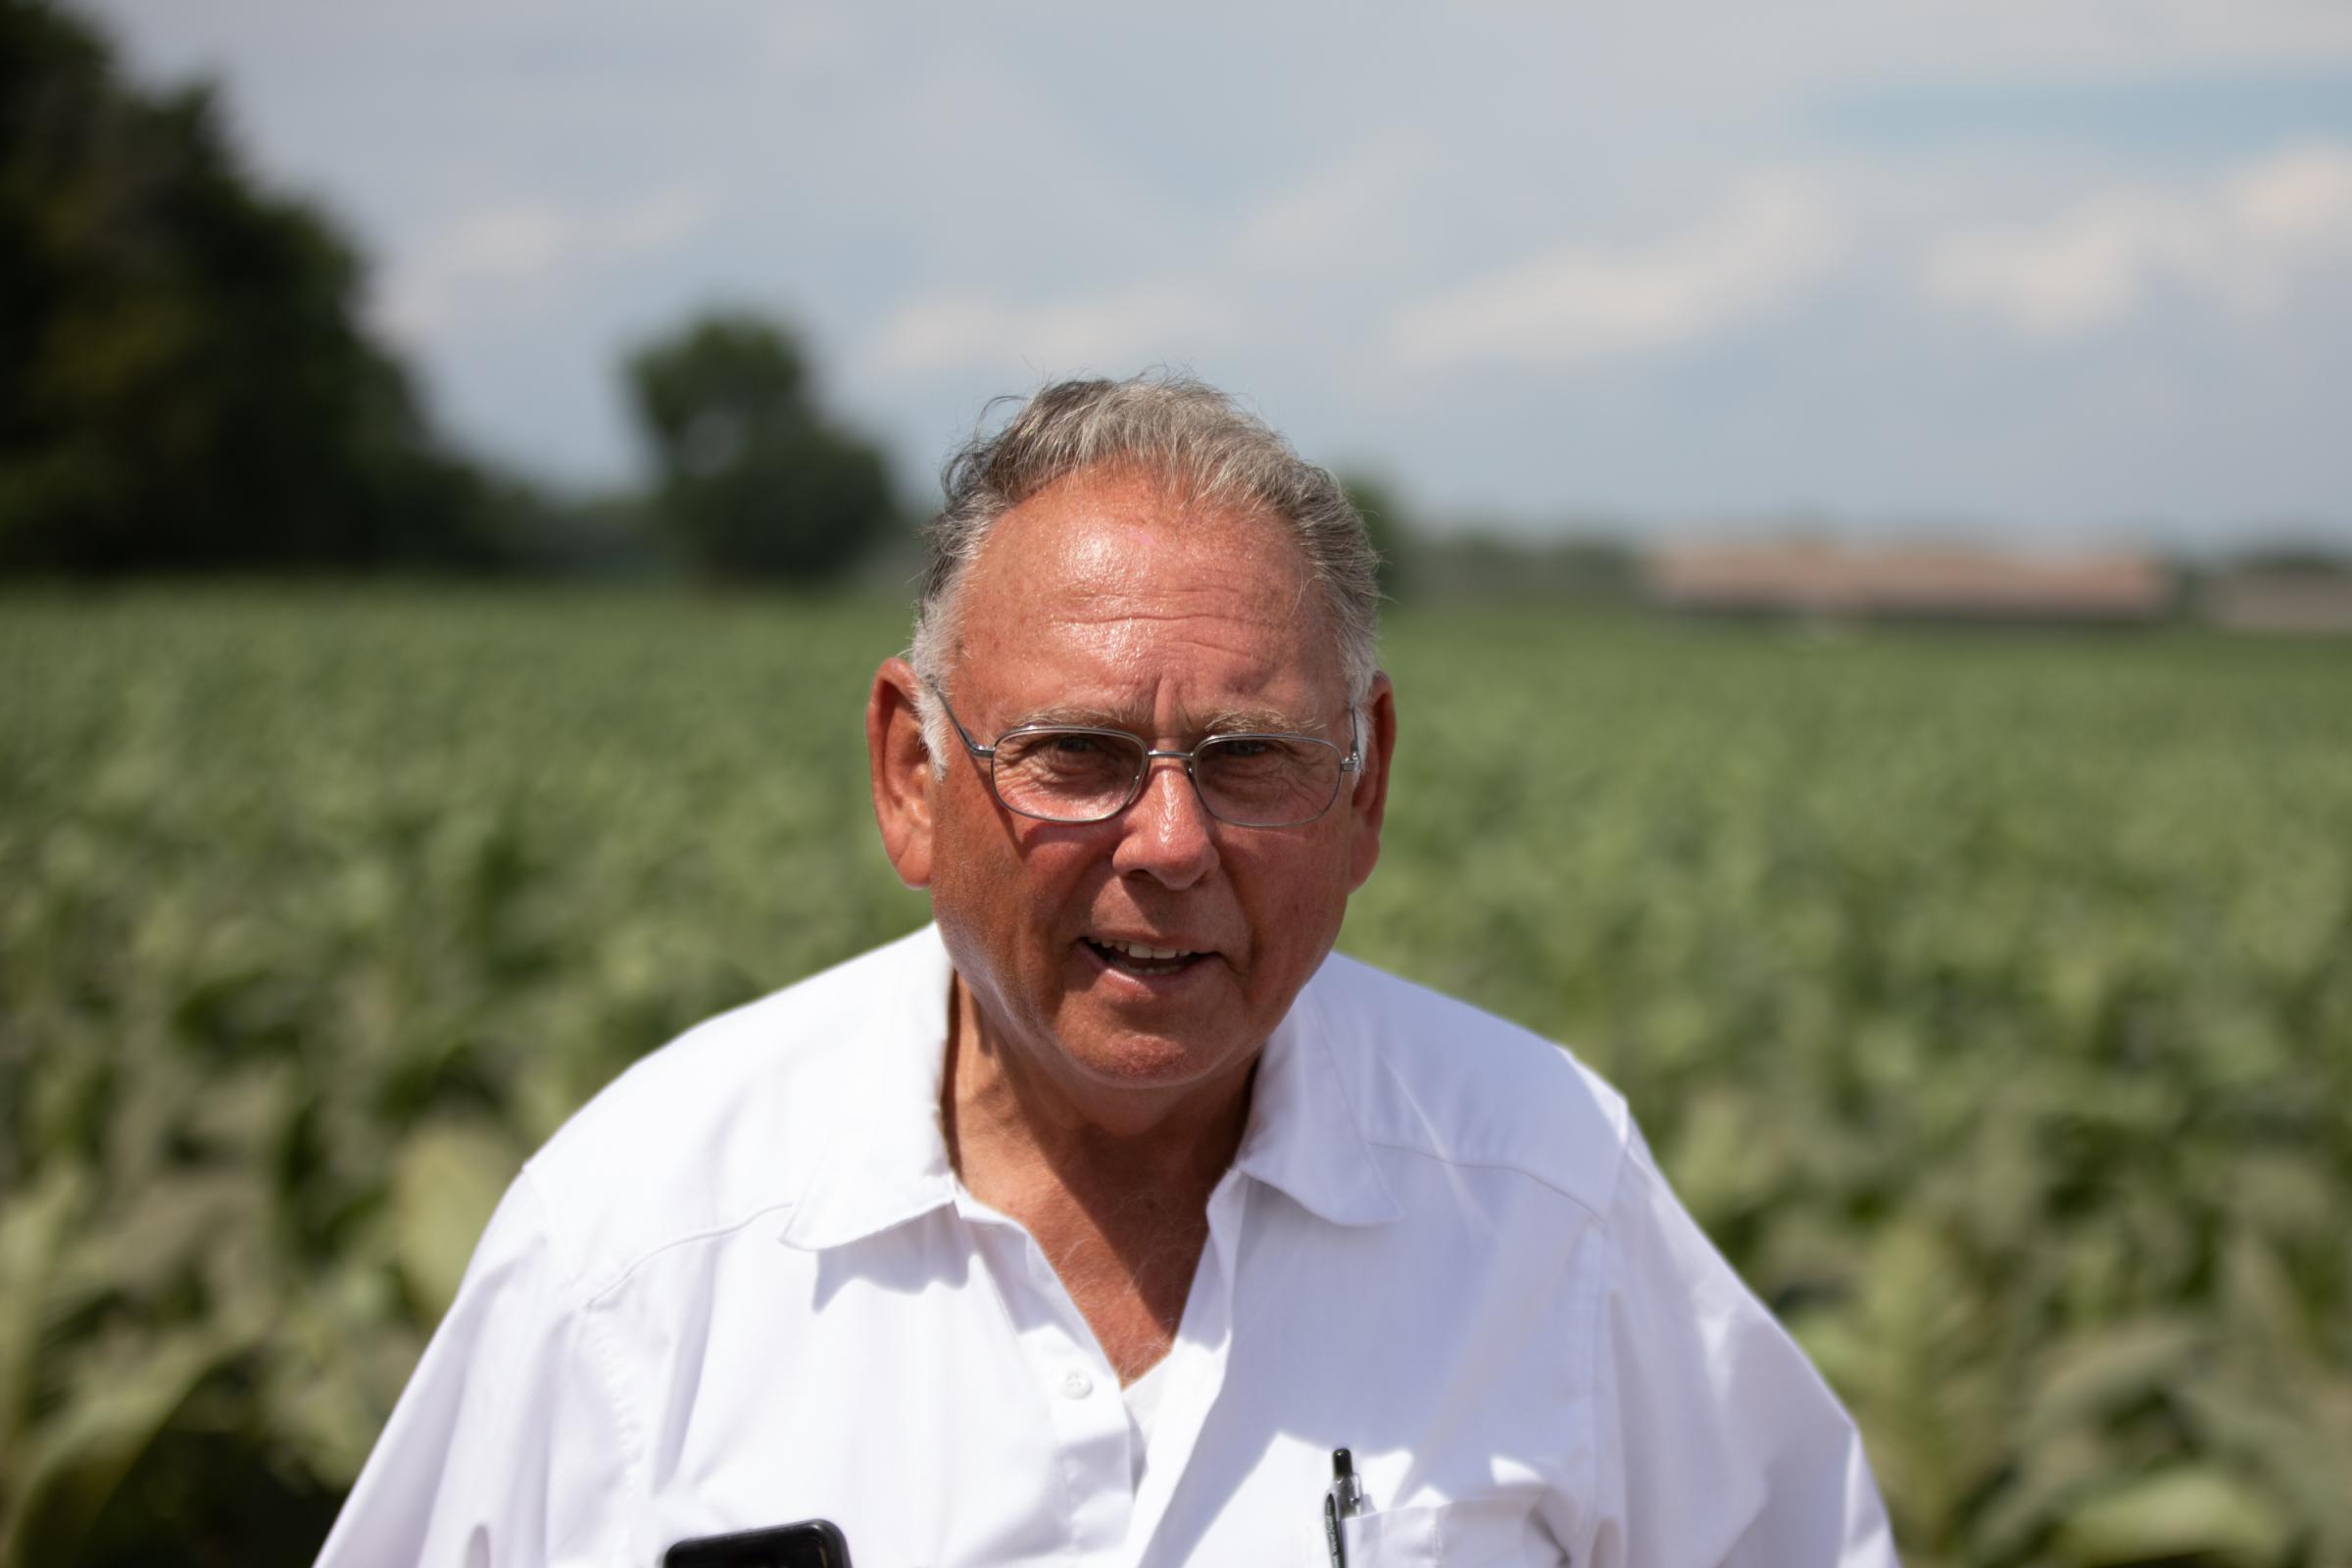 As Hemp Gets Planted, Connecticut Farmers Cautiously Optimistic